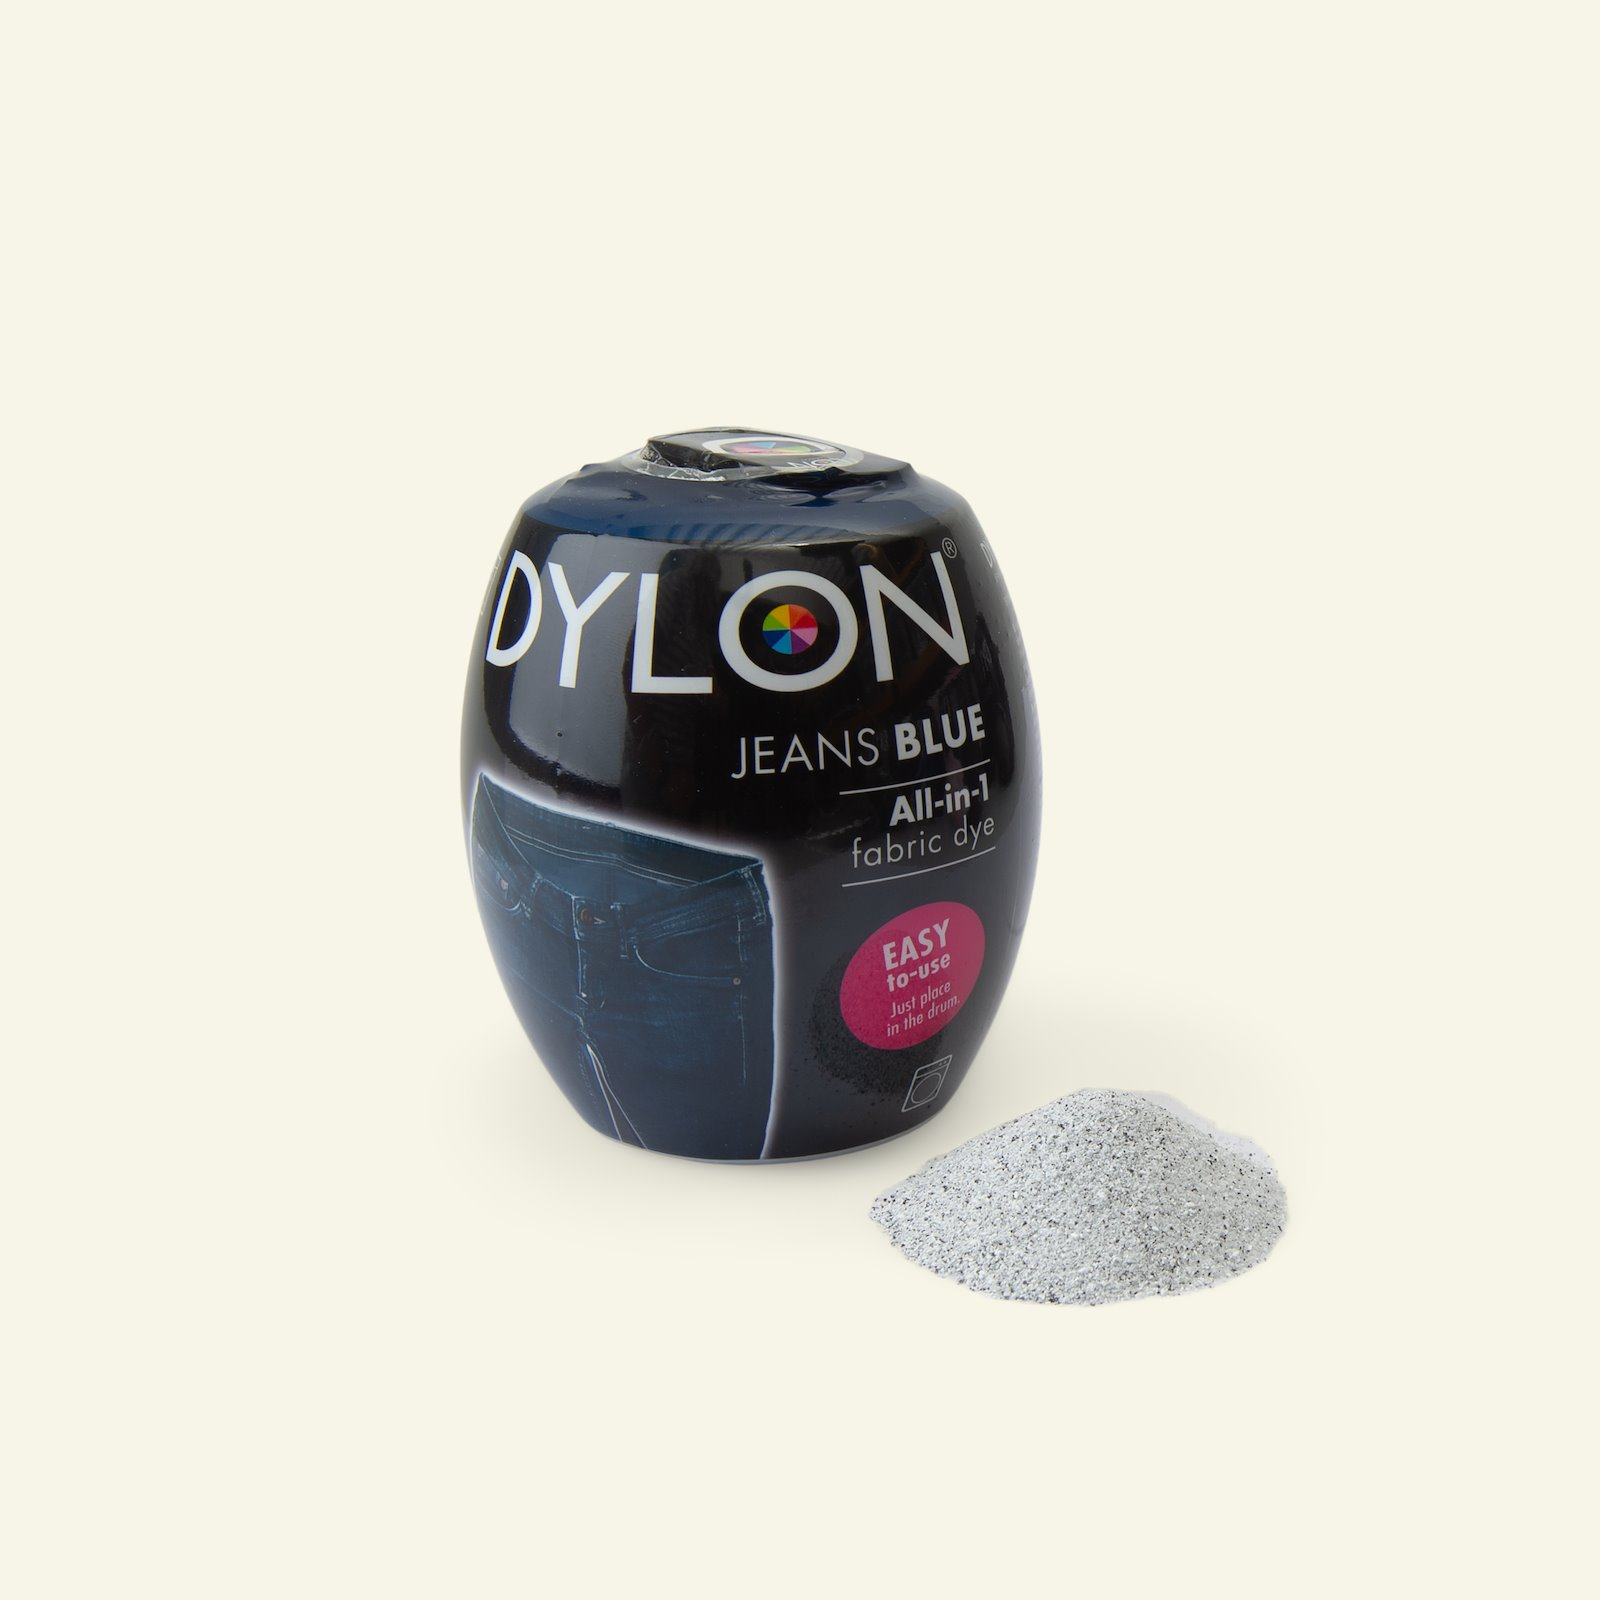 Dylon fabric dye for machine dark blue 29711_pack